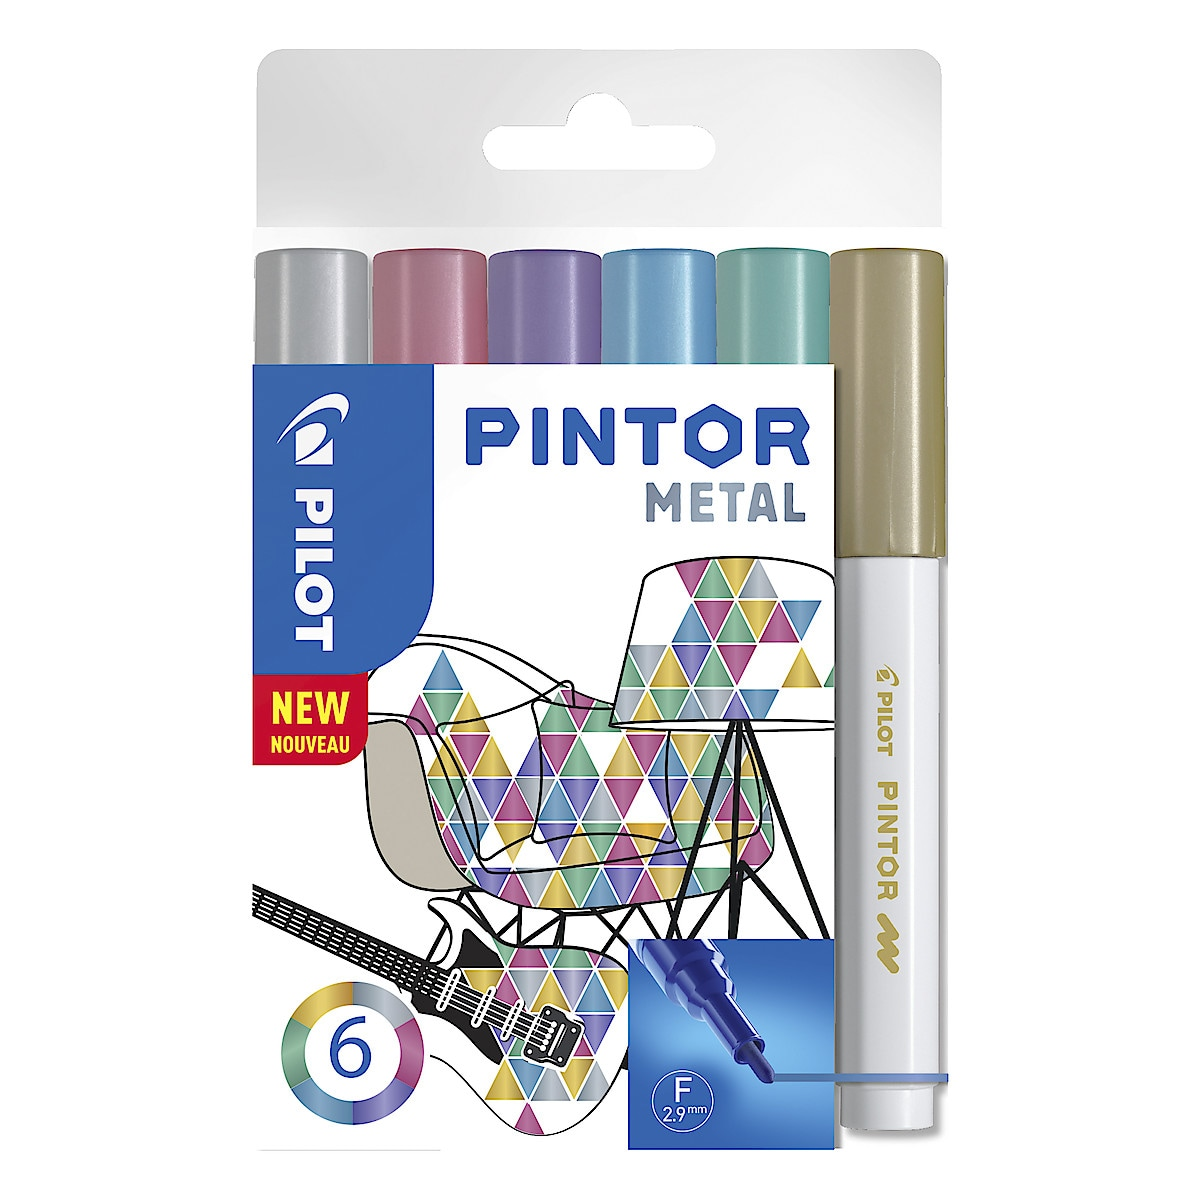 Märkpennor Pilot Pintor metal 6-pack